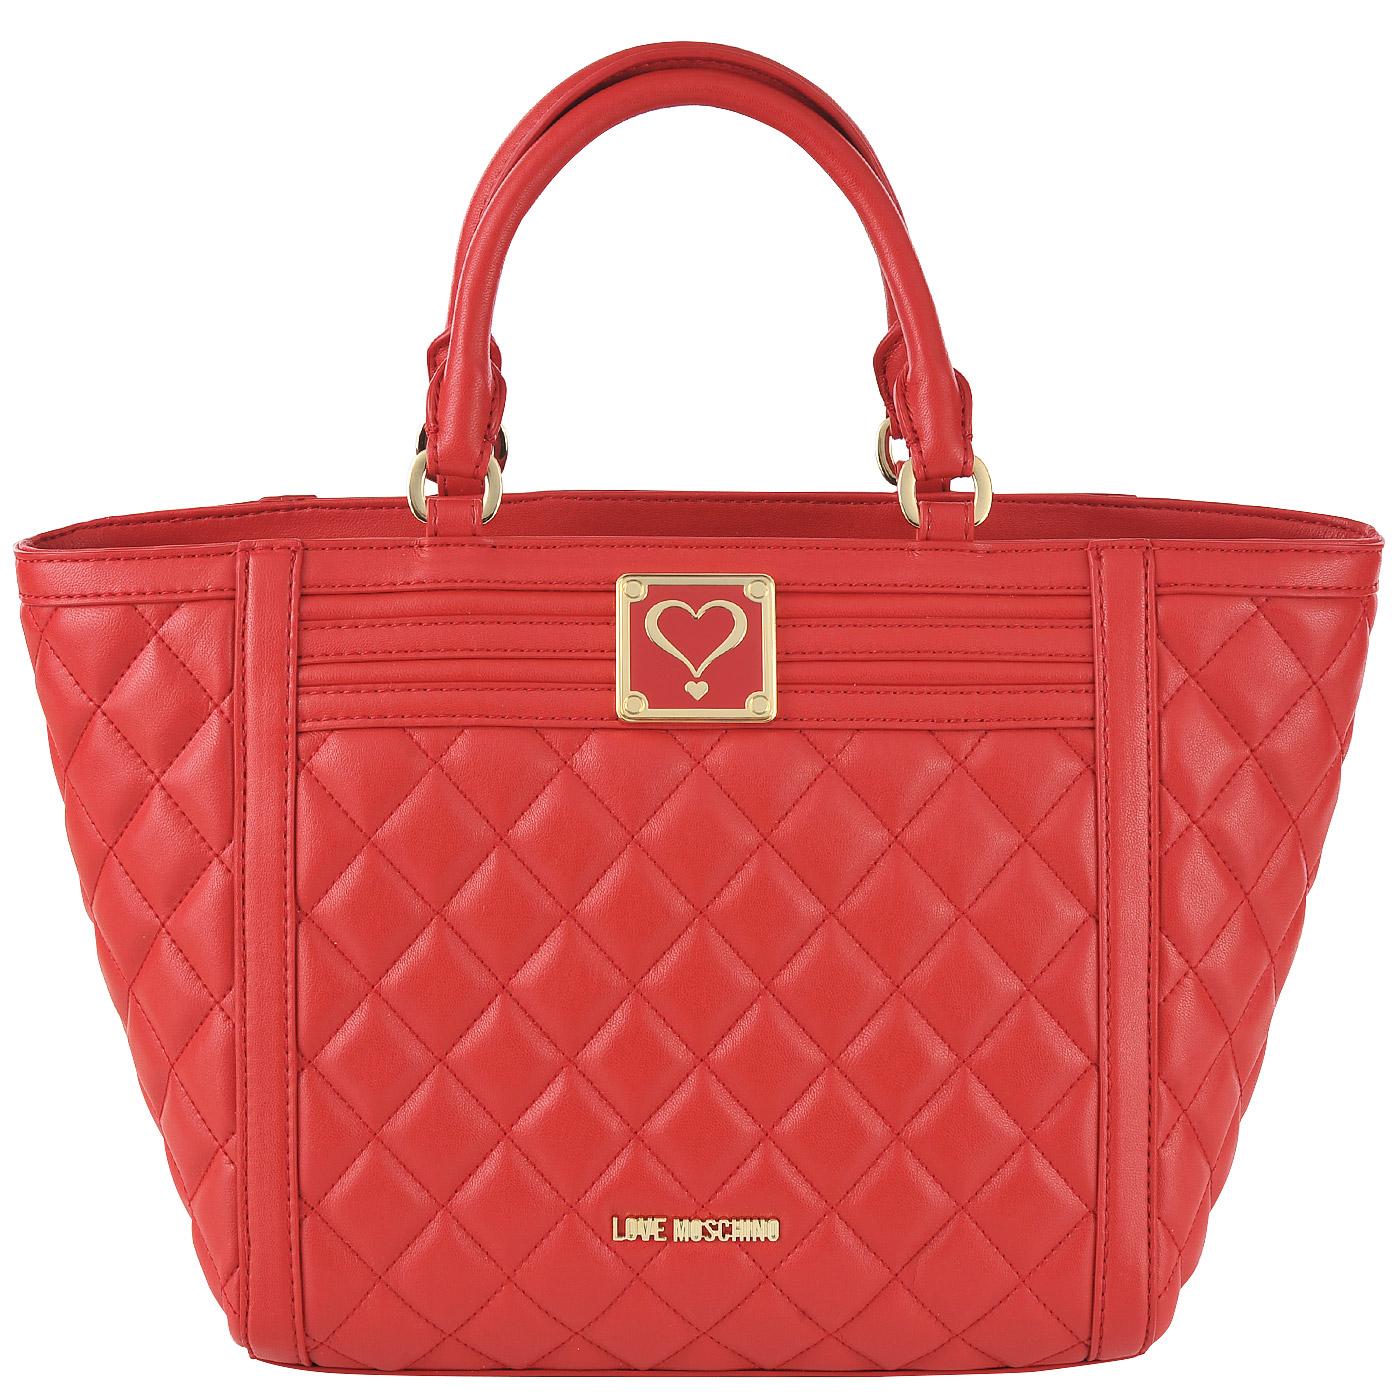 c86ac467d9cd Женская сумка Love Moschino Super Quilted Женская сумка Love Moschino Super  Quilted ...